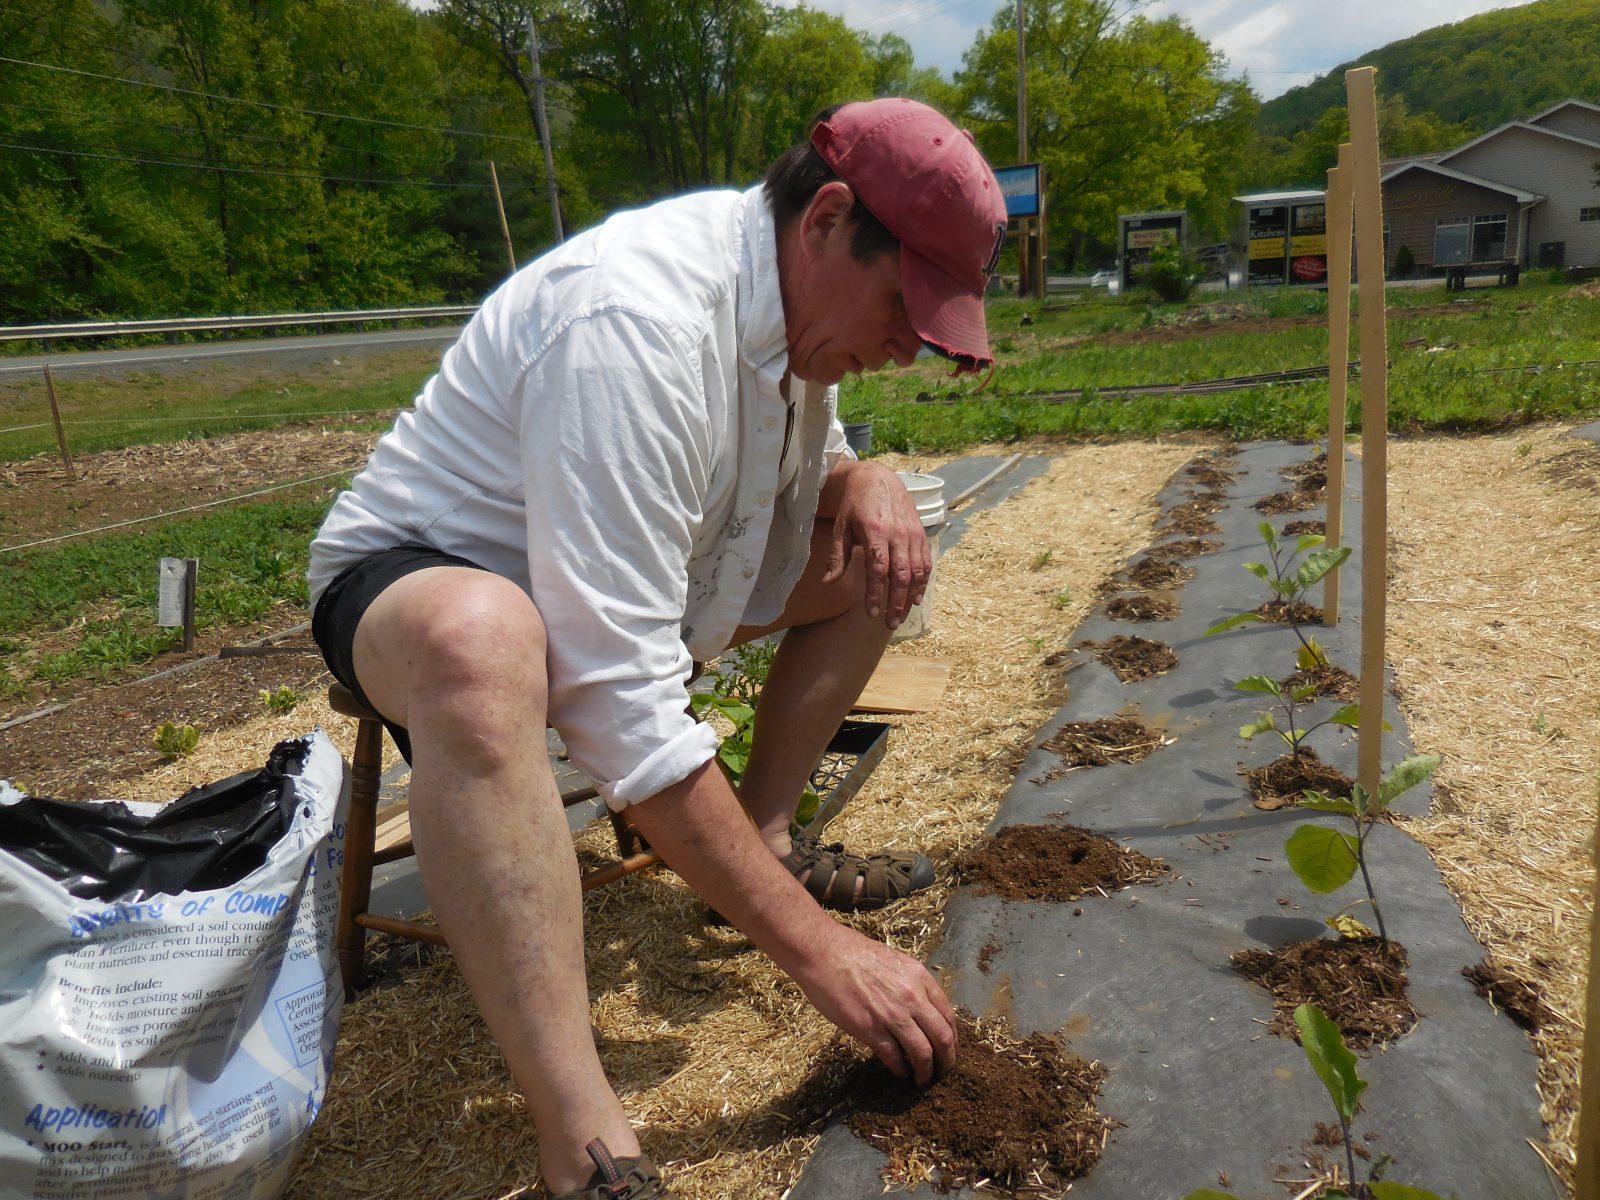 Growing vegetables community garden style